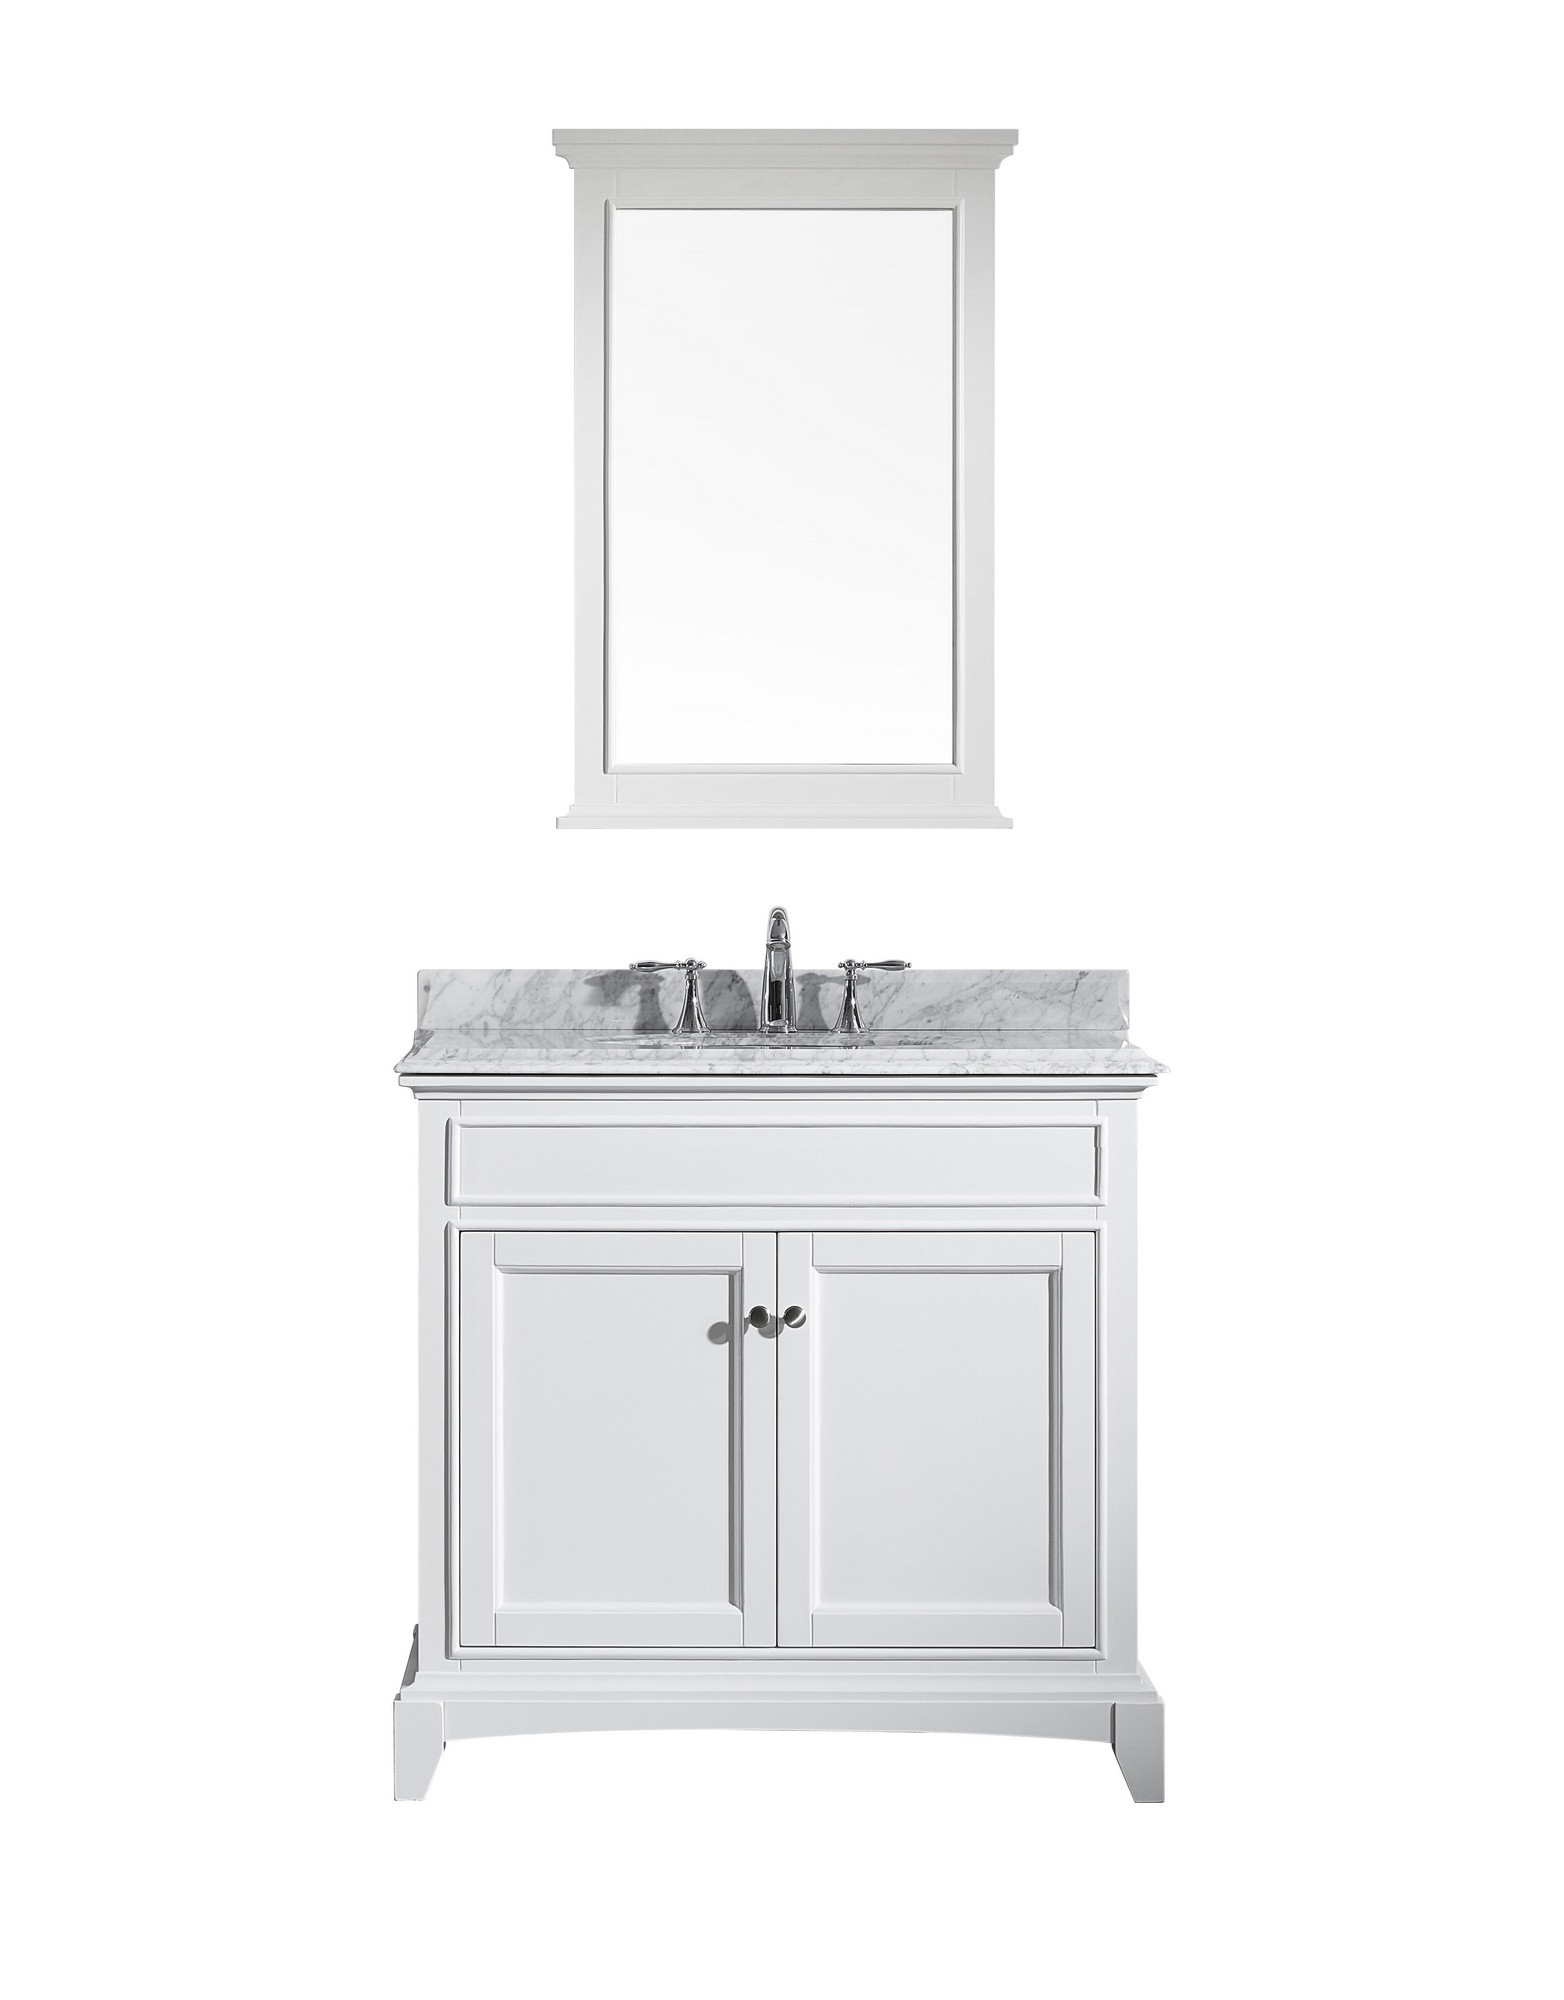 Eviva EVVN709-36WH Elite Stamford® White Wood Bath Vanity with Double OG White Carrera Marble Top